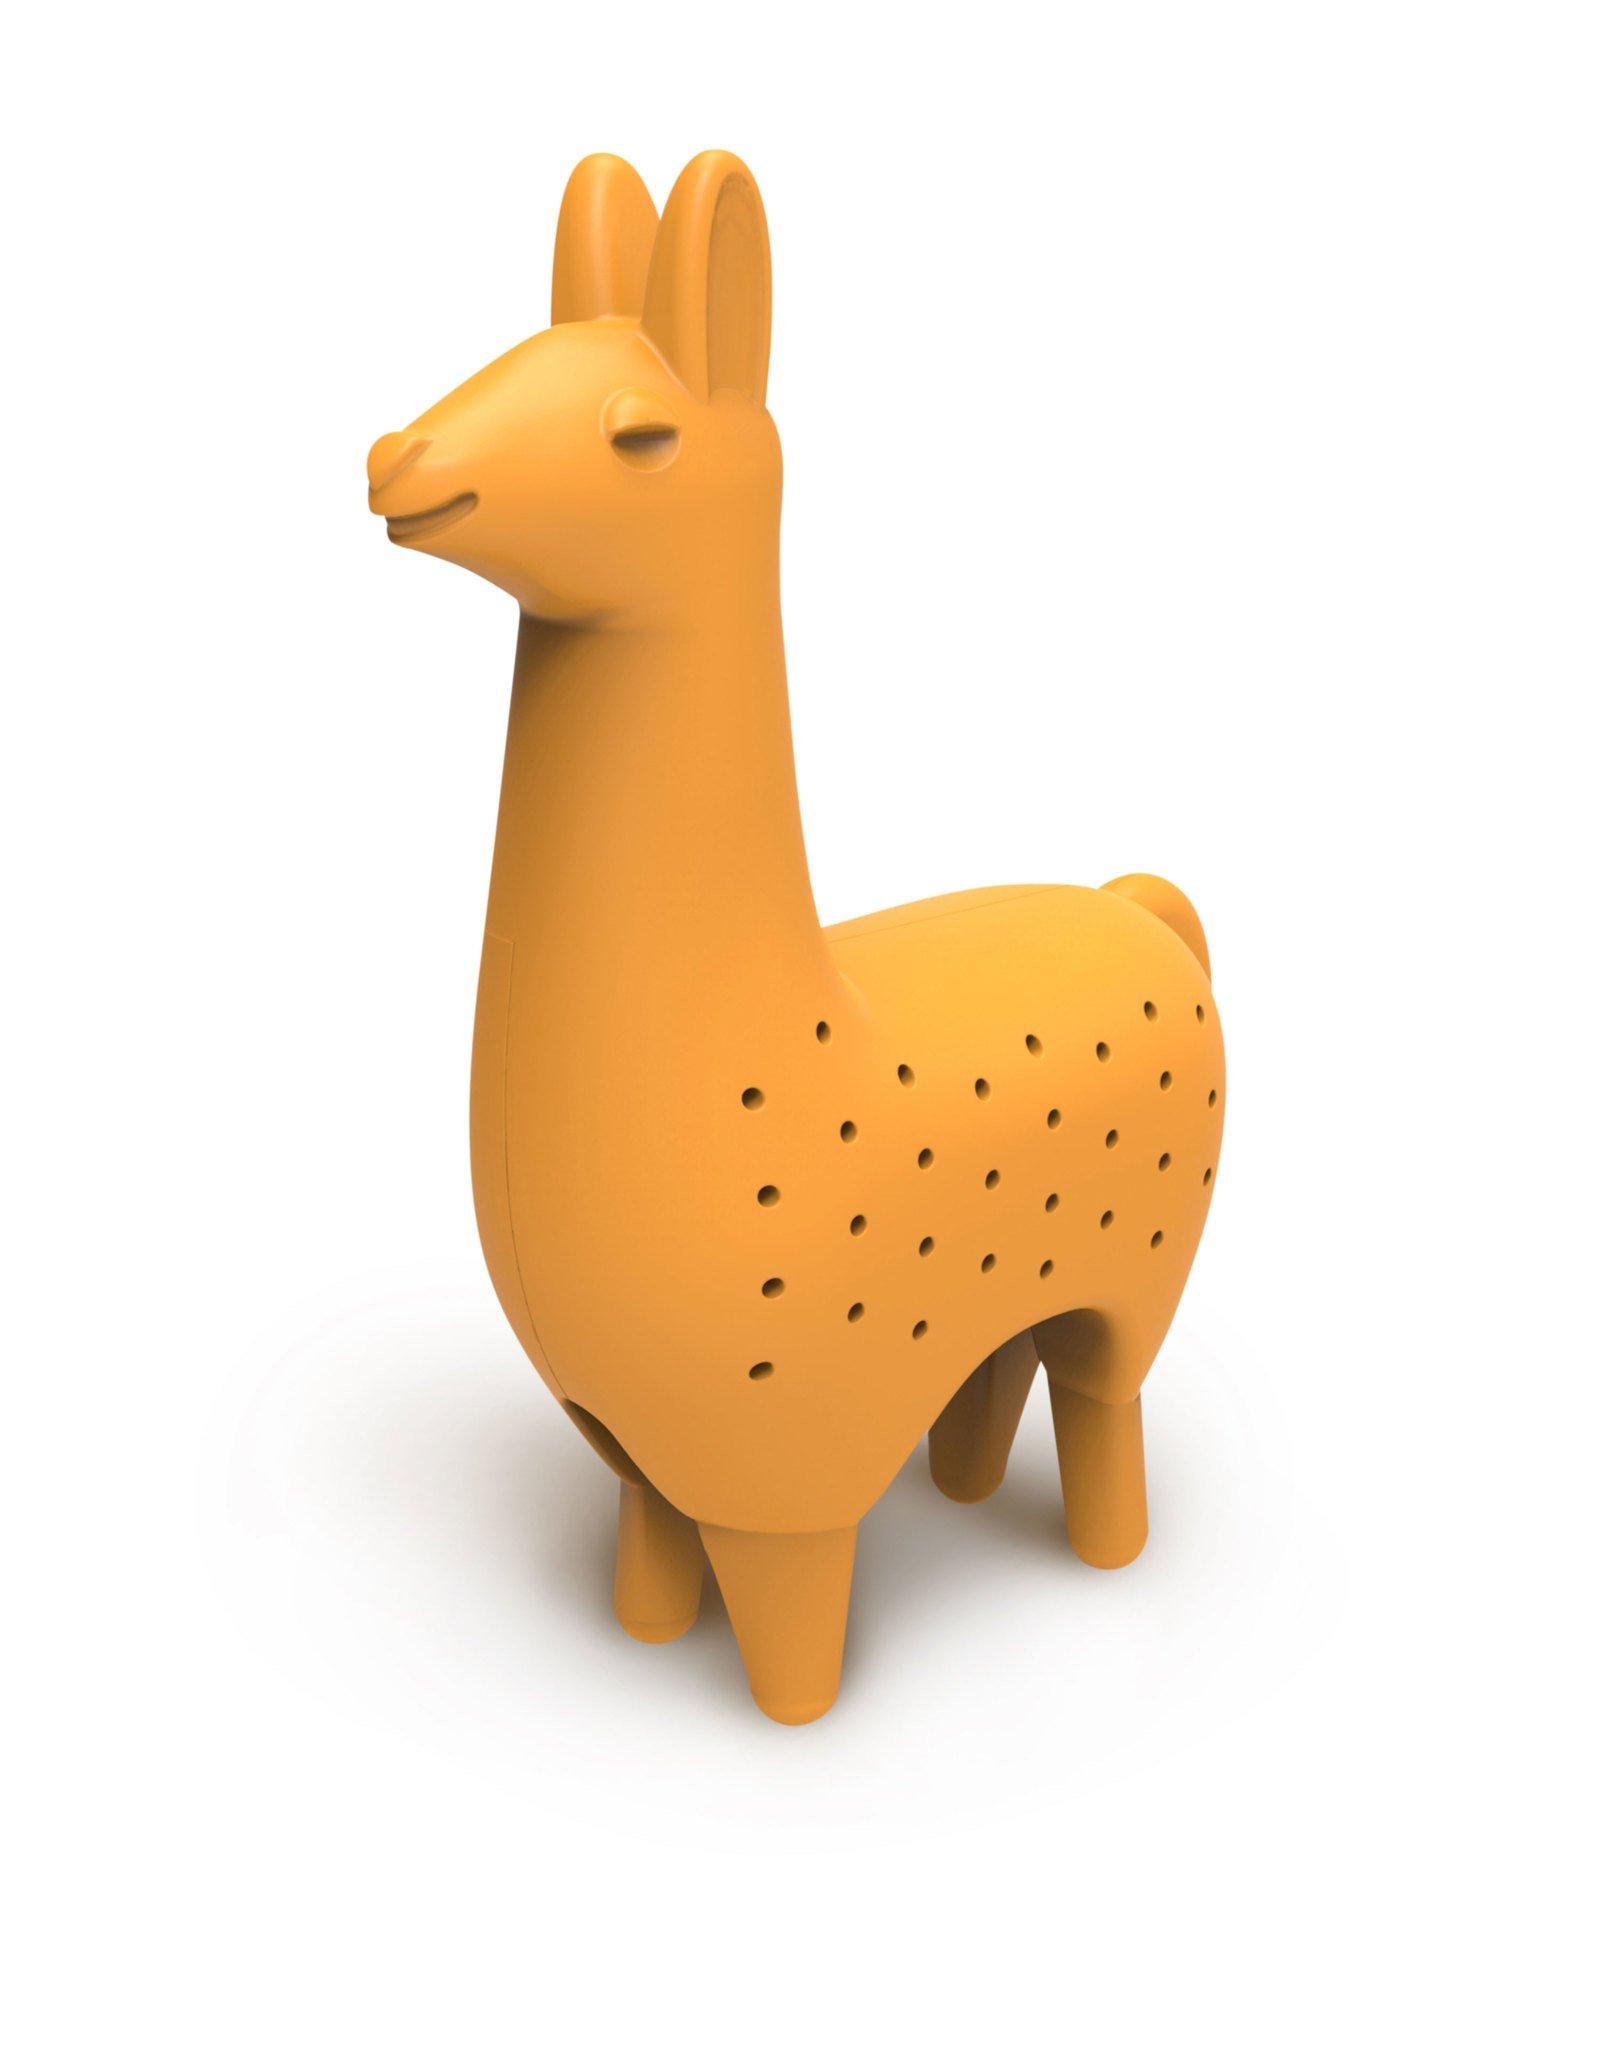 Fred 5228626 Silicone Tea Infuser regular Como Llama